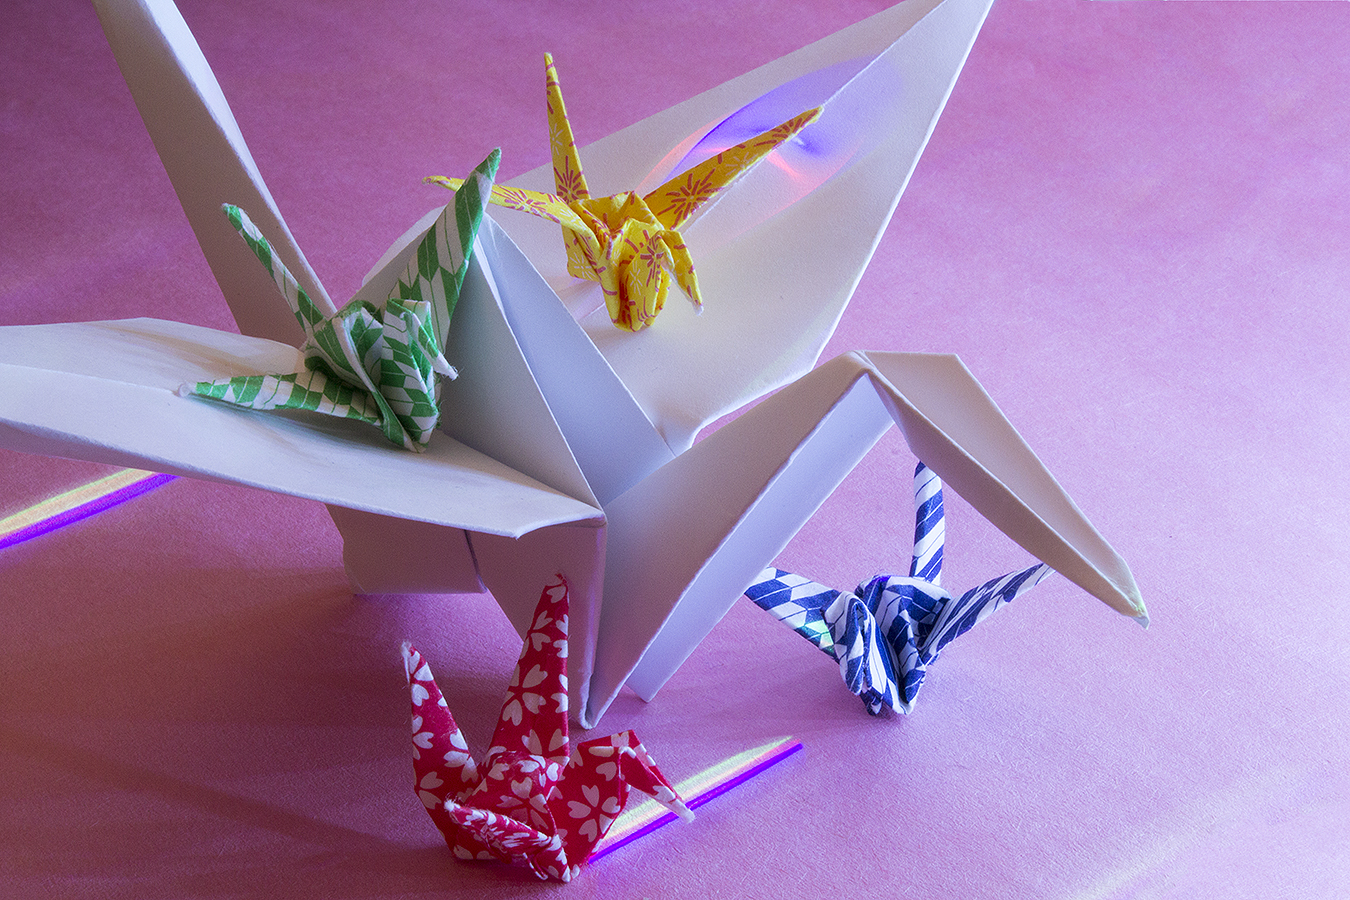 21_Birds_Jonathan_Tang_UPenn_Tony_Ward_Studio_Long_Exposure_Low_Light_LED_Optics_Origami_Paper_Cranes_Pink